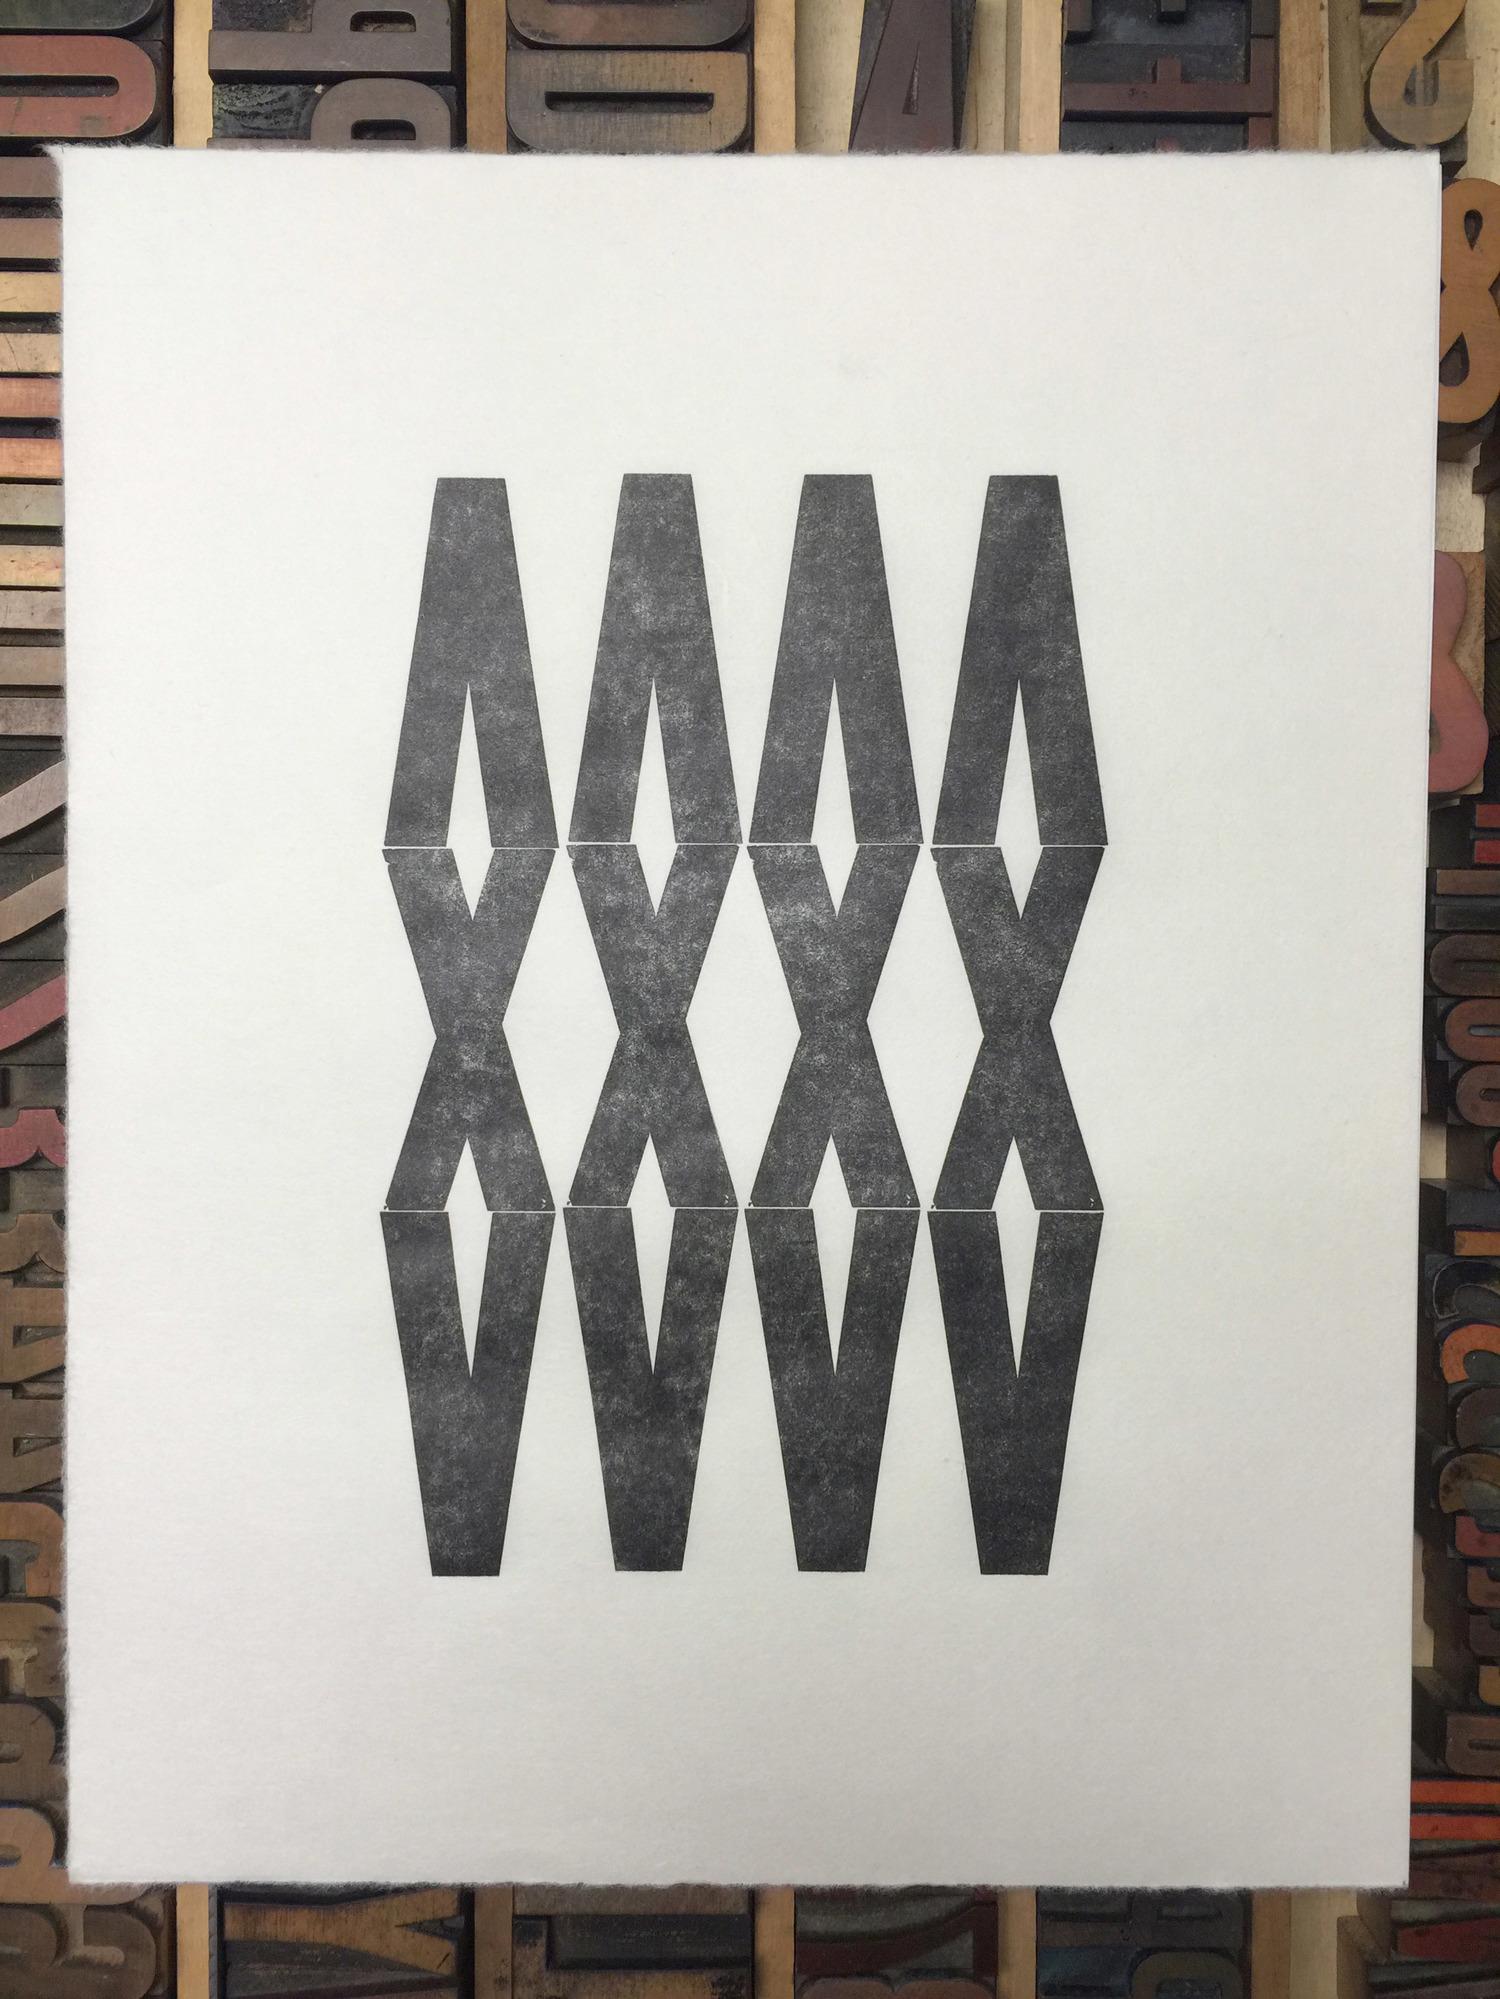 Bittner, Trailmarker no.3 Letterpress Print, 2014